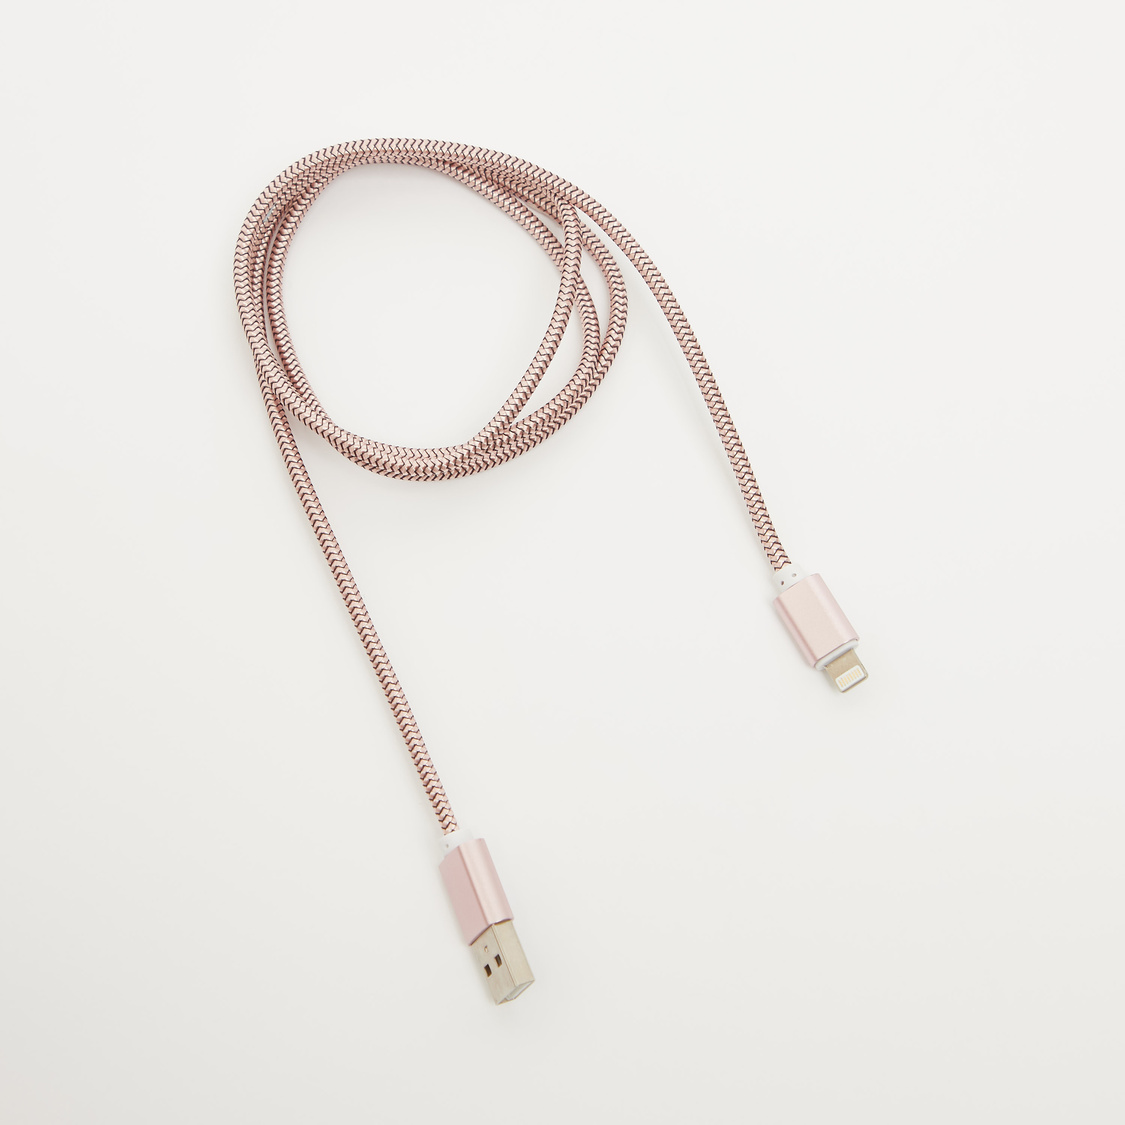 Metallic Textured USB Data Cable